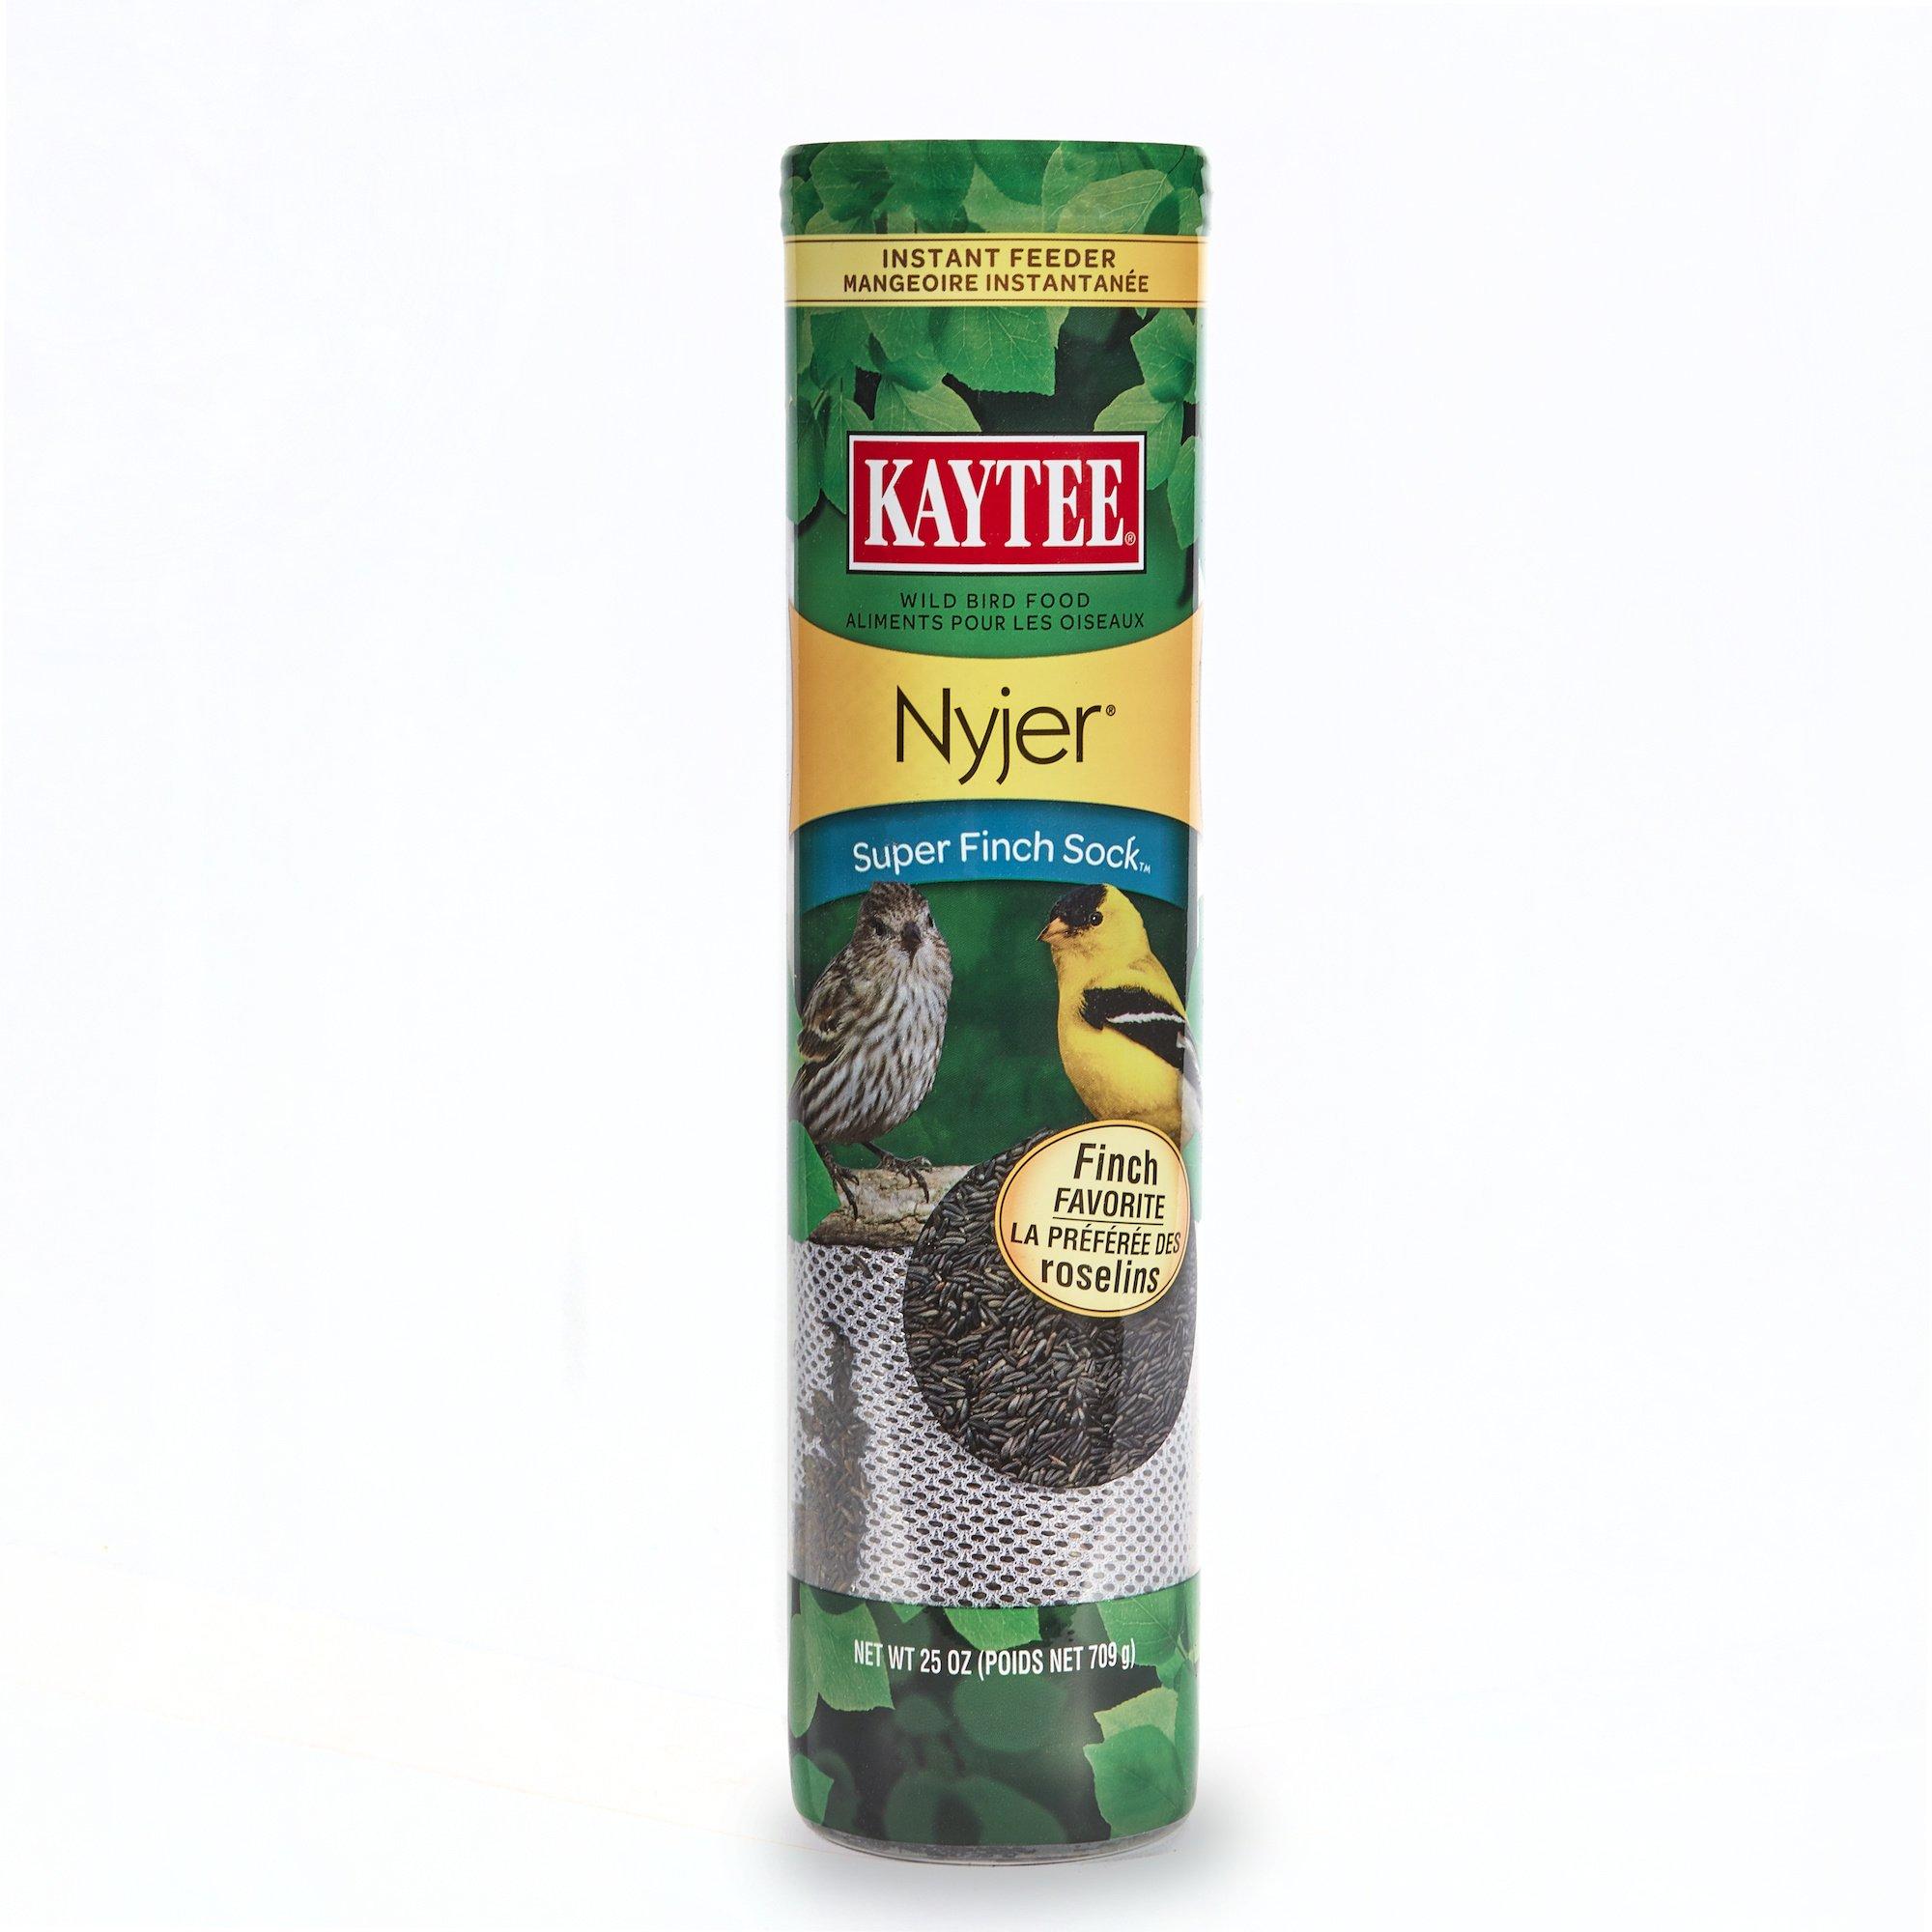 Kaytee Super Finch Sock Feeder, 25-Ounce by Kaytee